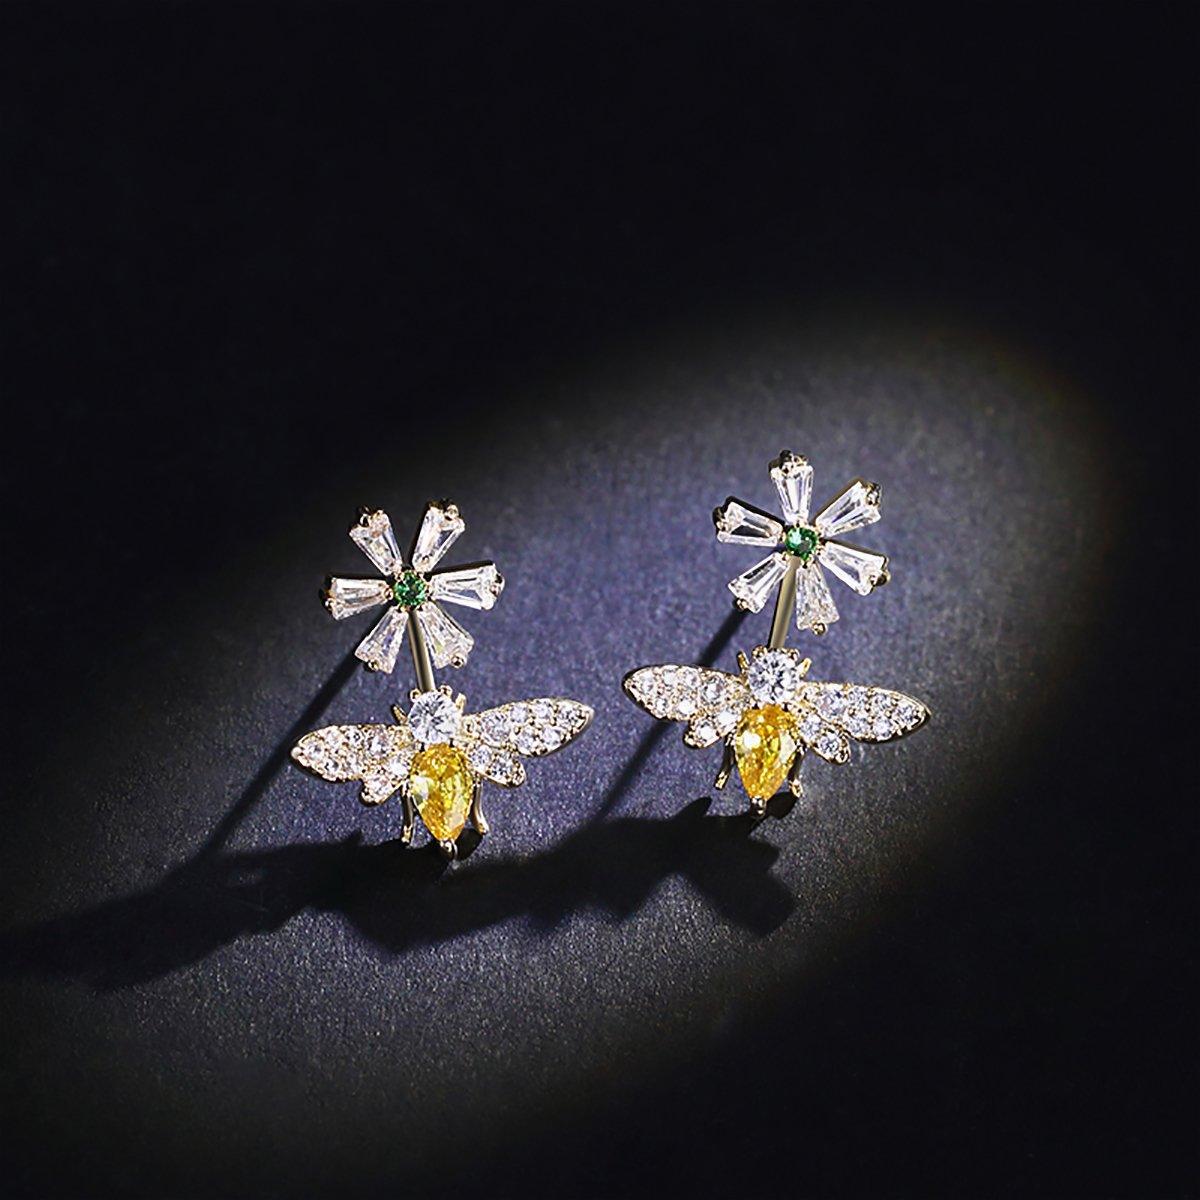 KesaPlan S925 Sterling Silver Bee Stud Earrings Cubic Zirconia Earrings